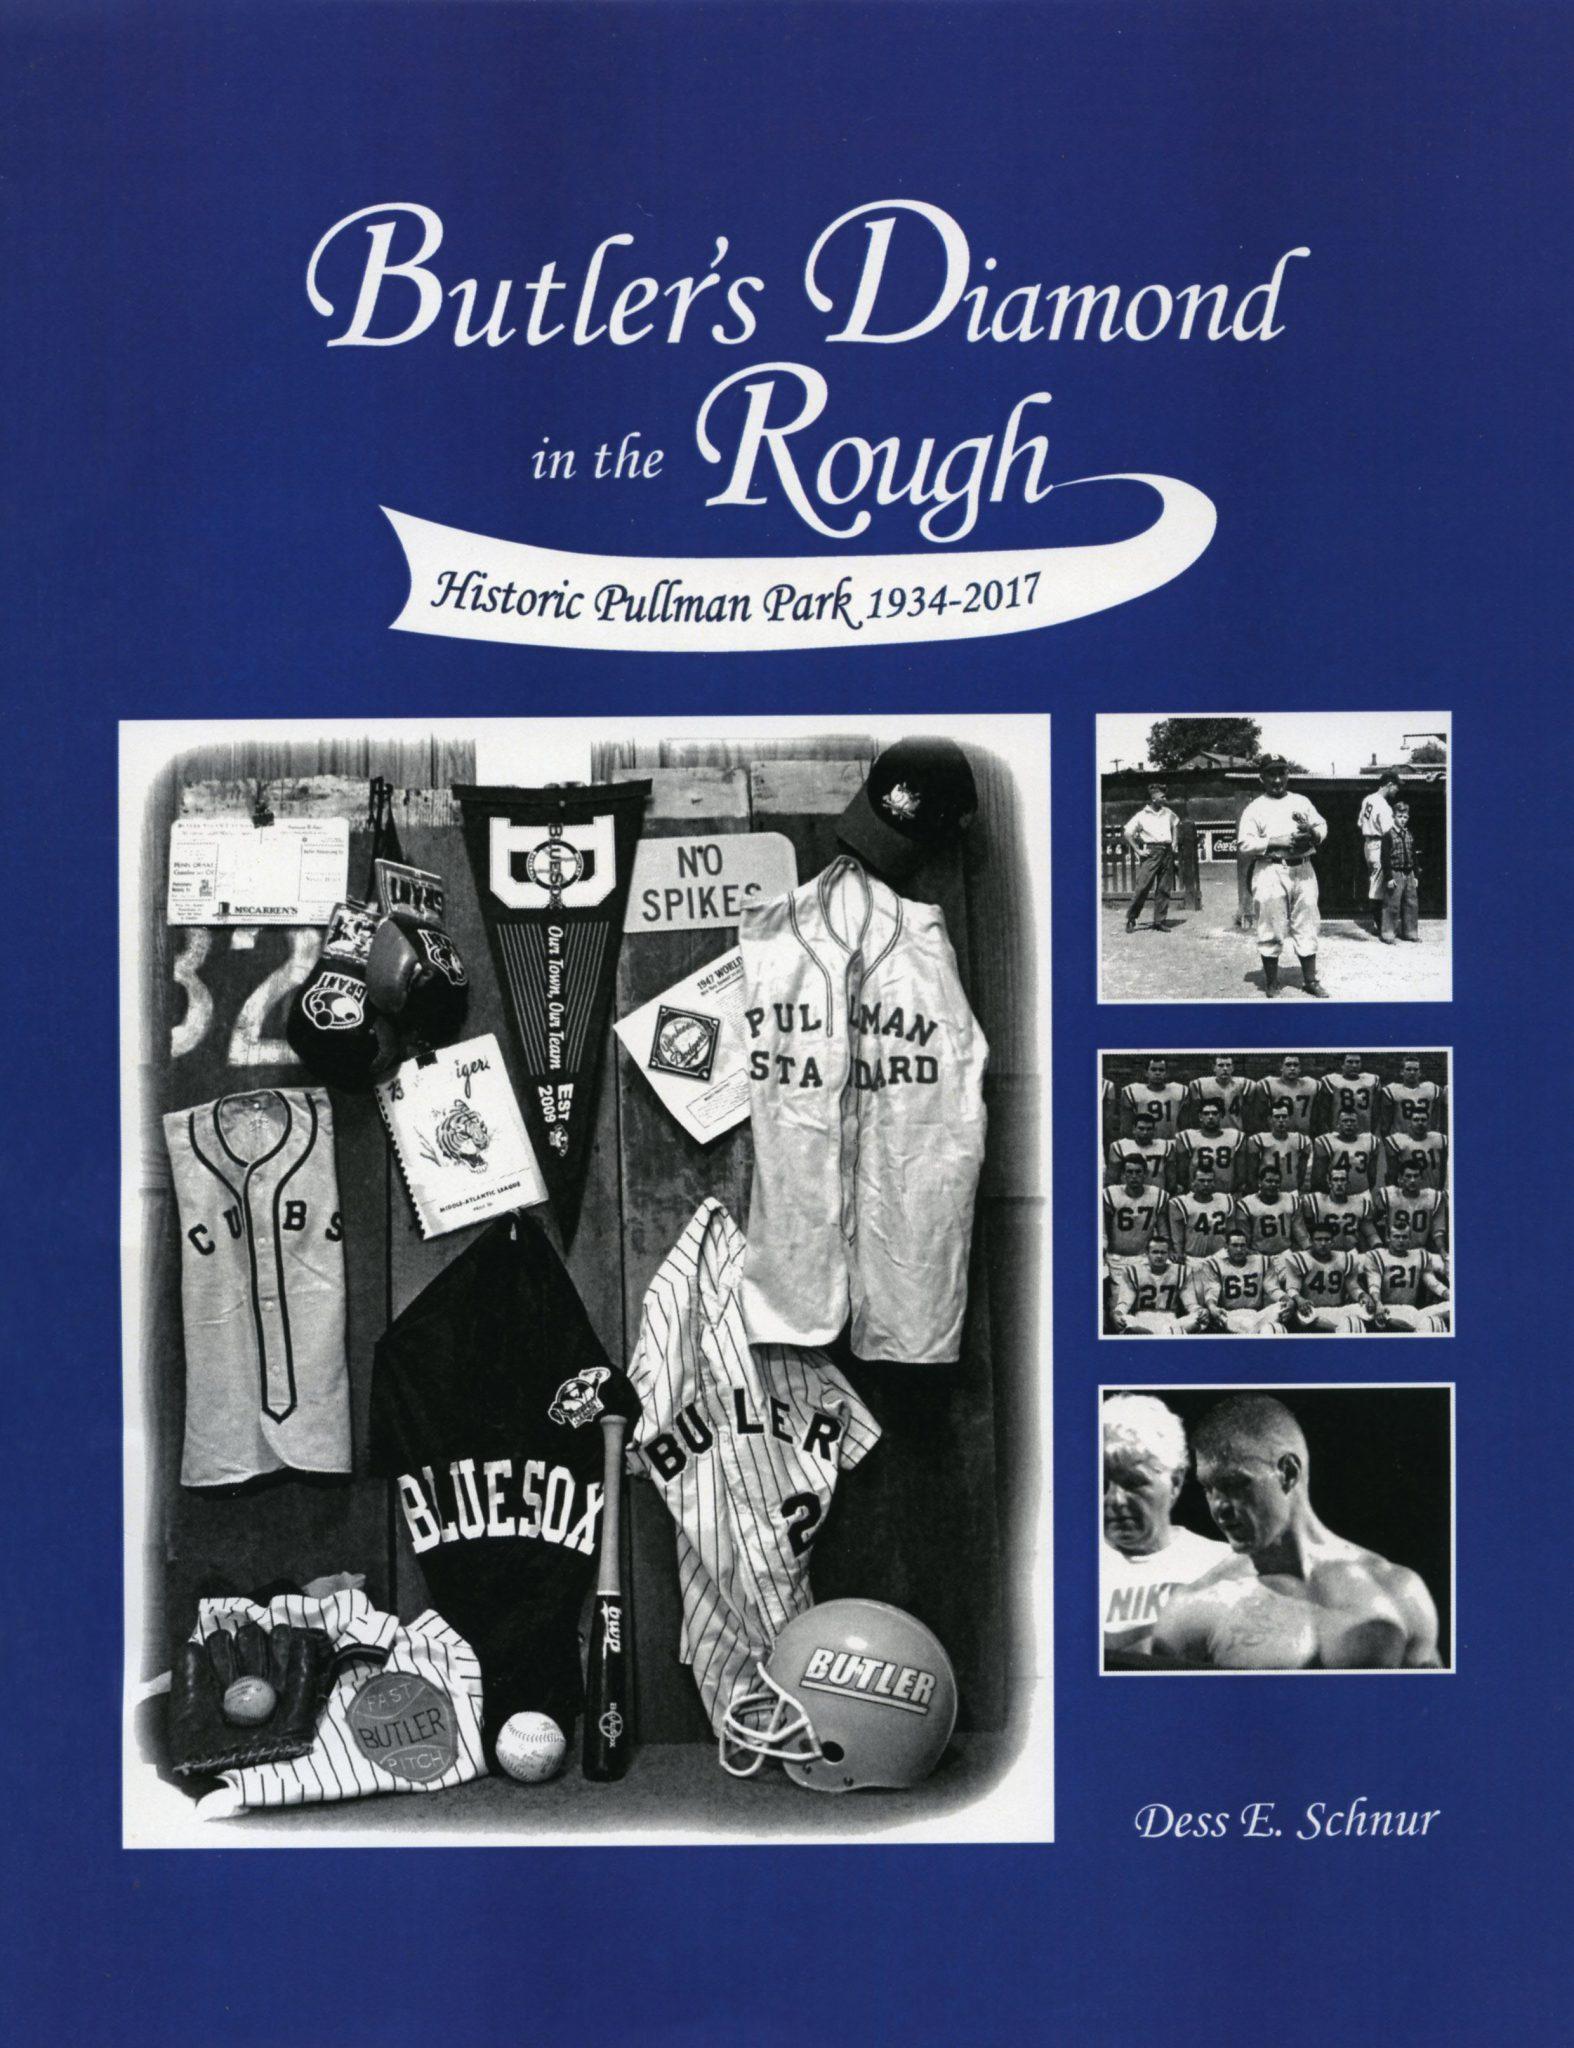 Butler's Diamond in the Rough